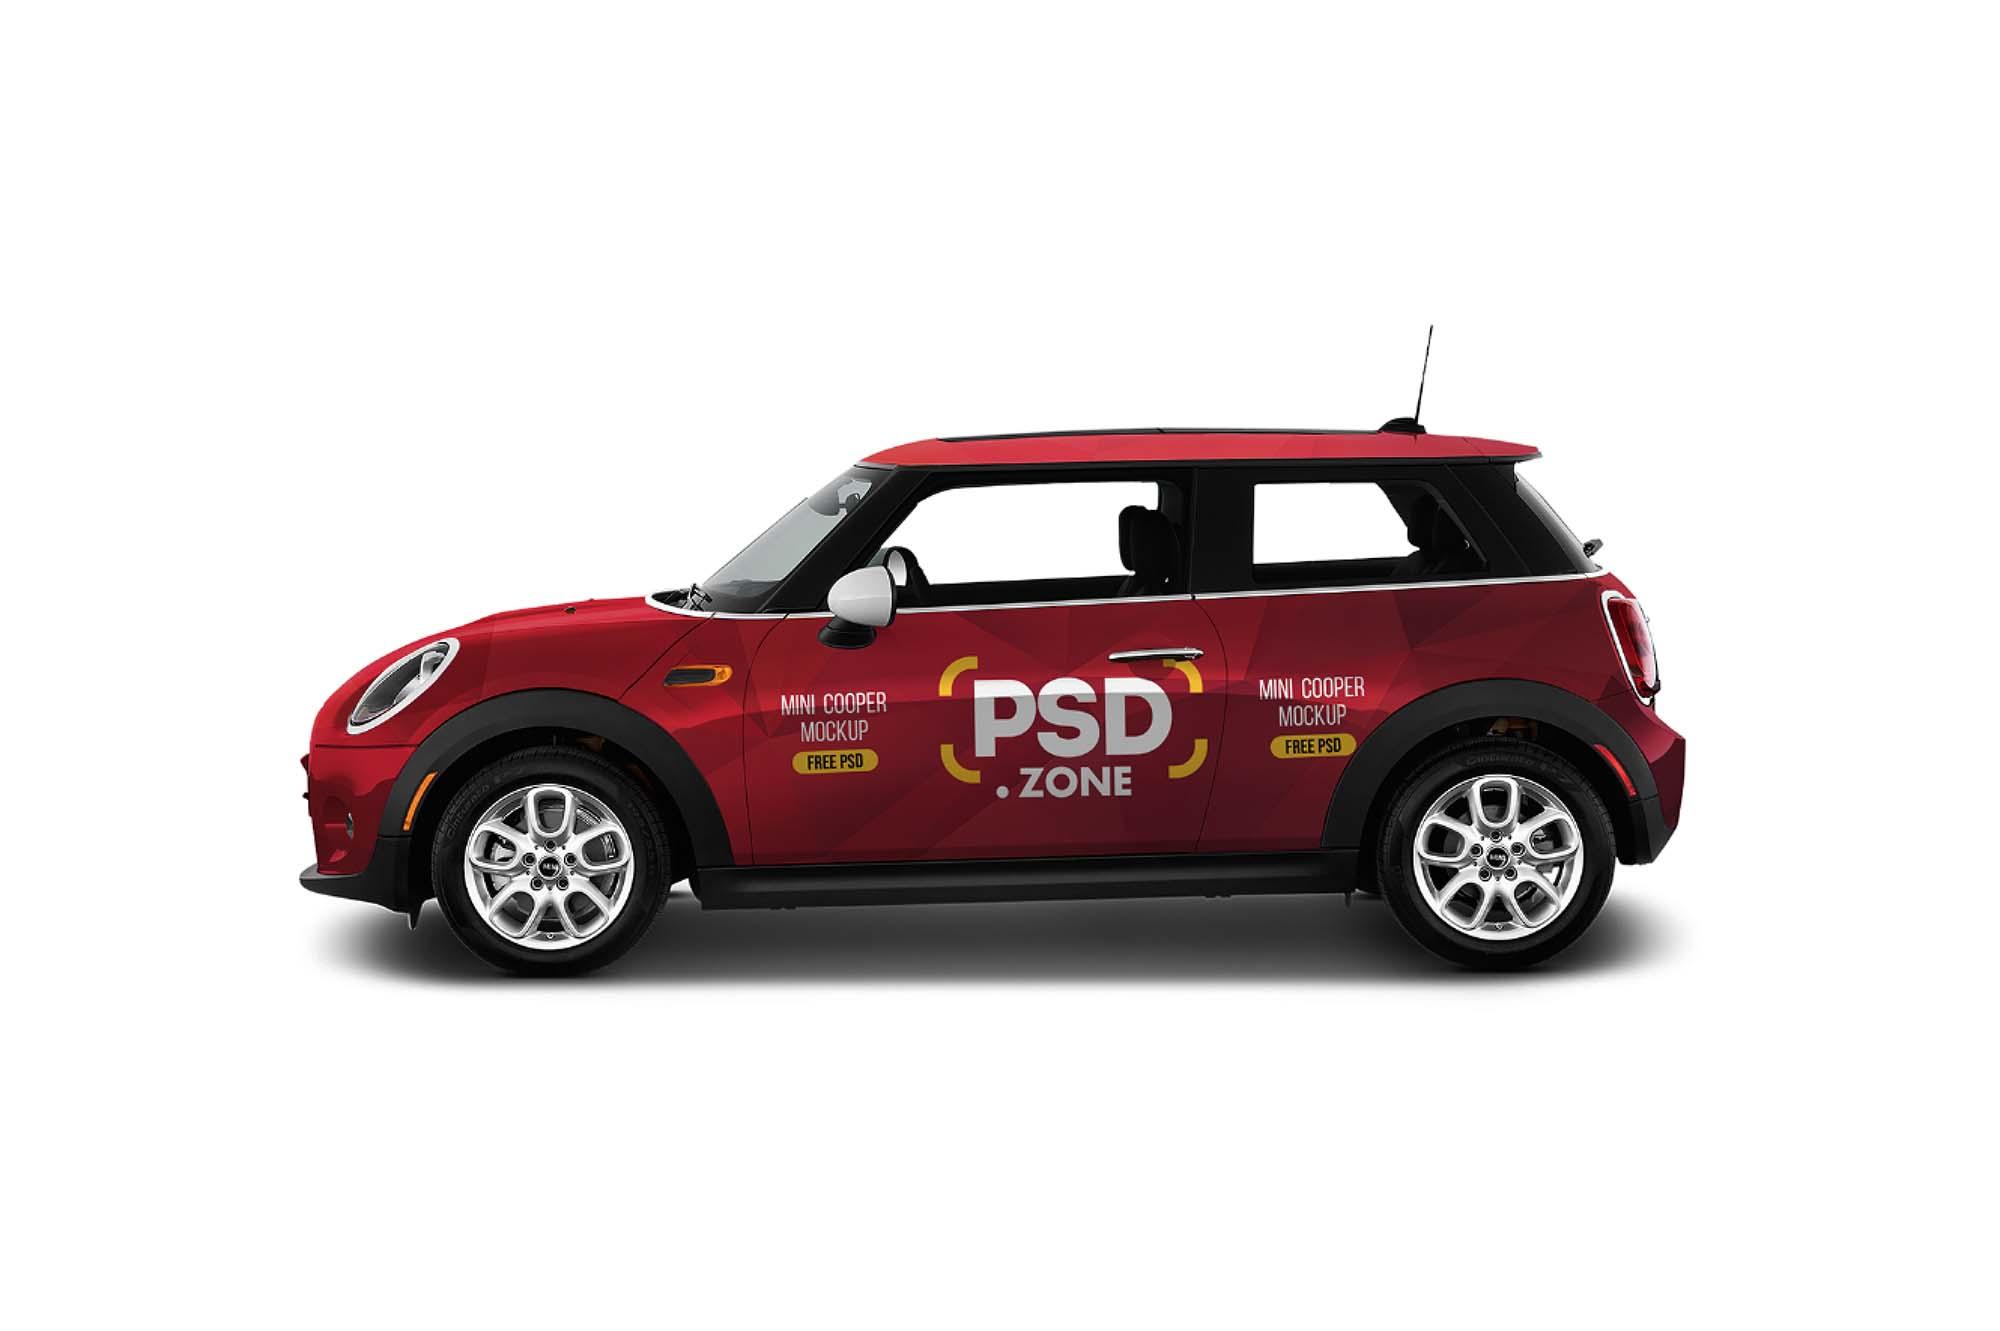 Mini Cooper Car Mockup